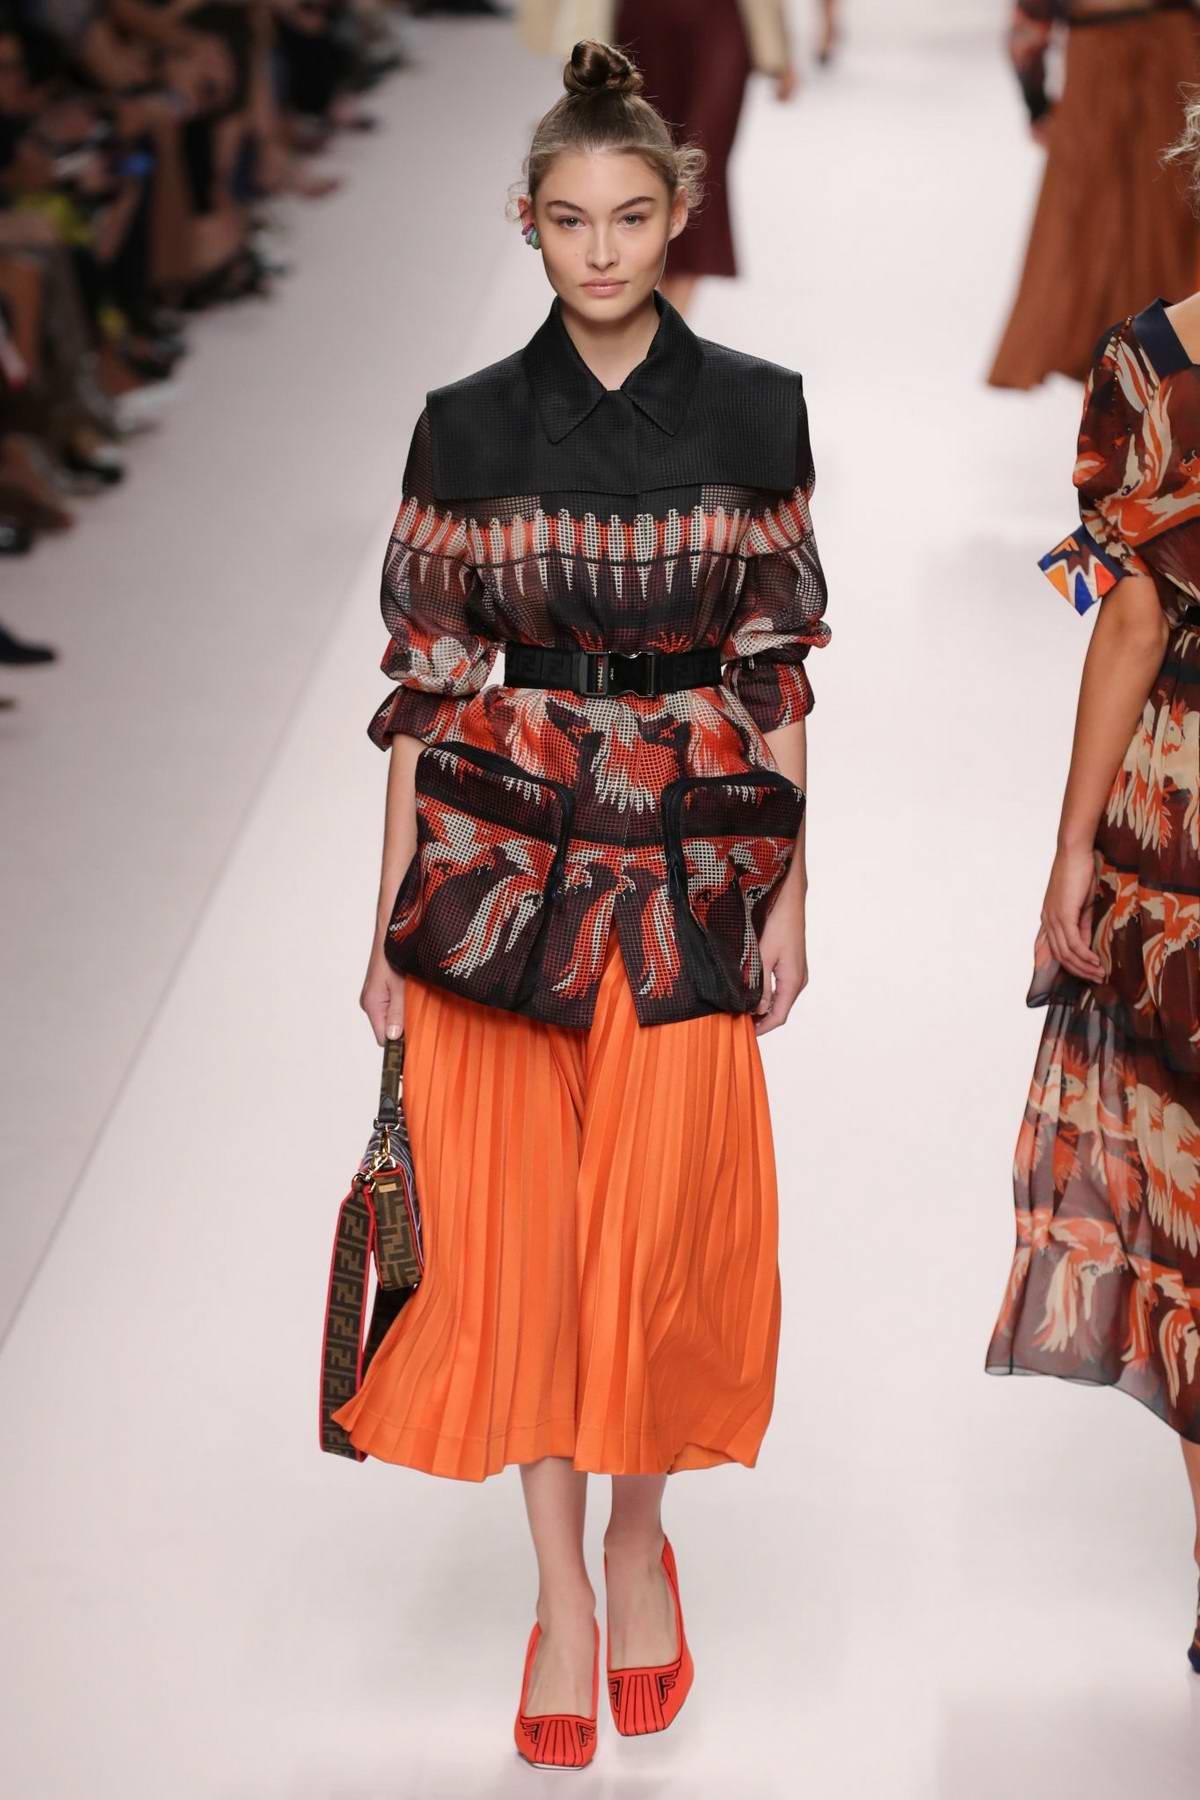 Grace Elizabeth walks the runway for Fendi Fashion Show, Summer-Spring 2019 during Milan Fashion Week in Milan, Italy